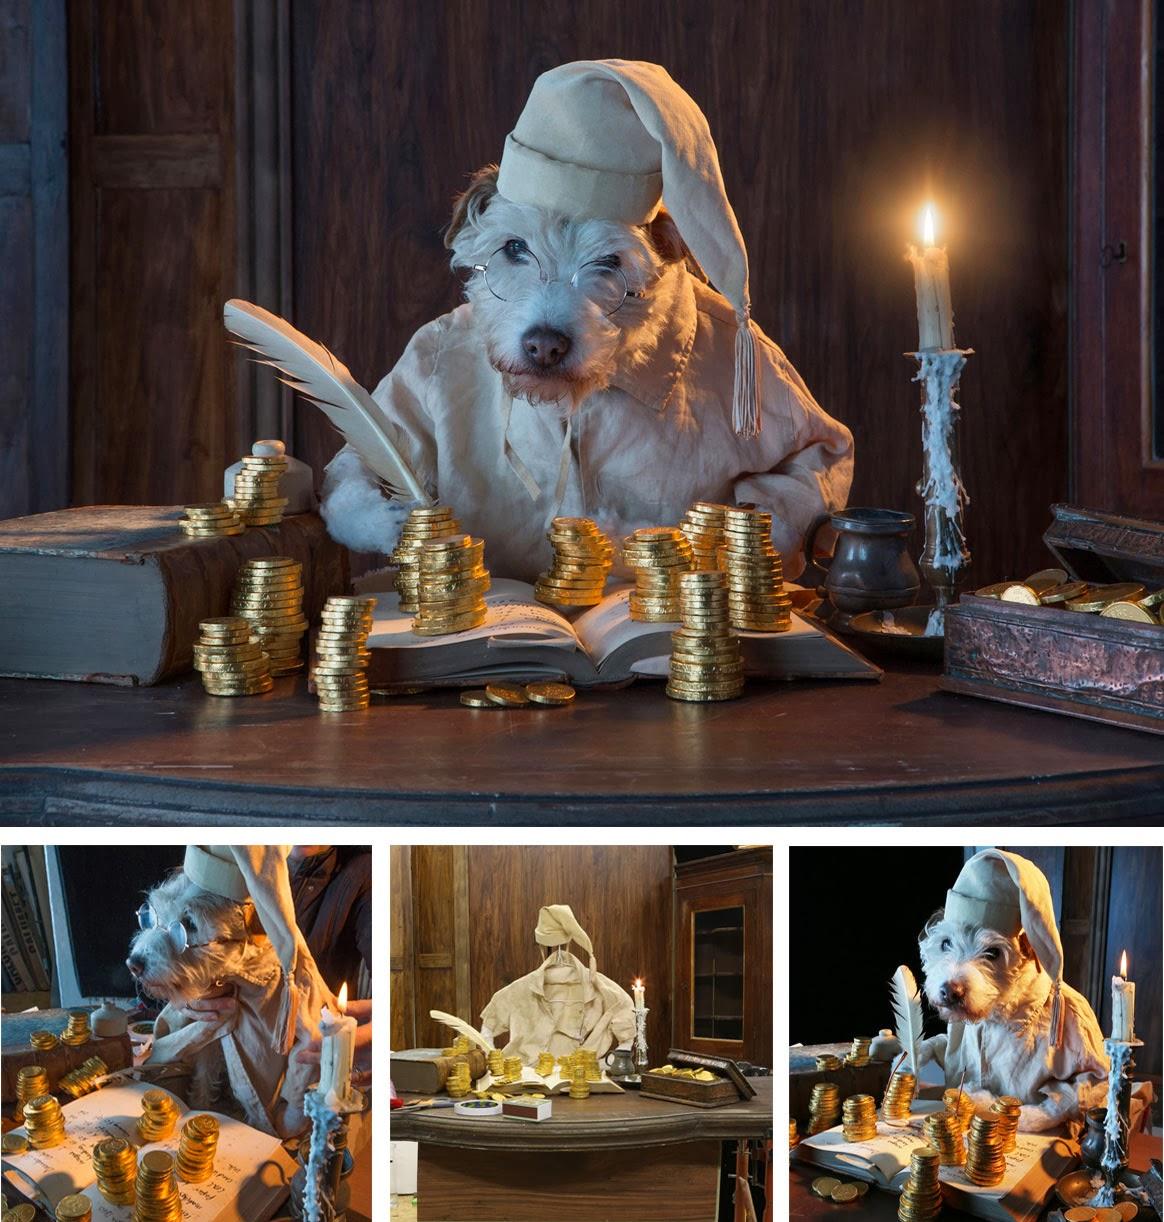 Peter-Thorpe-Photographer-Greeting-Cards-003